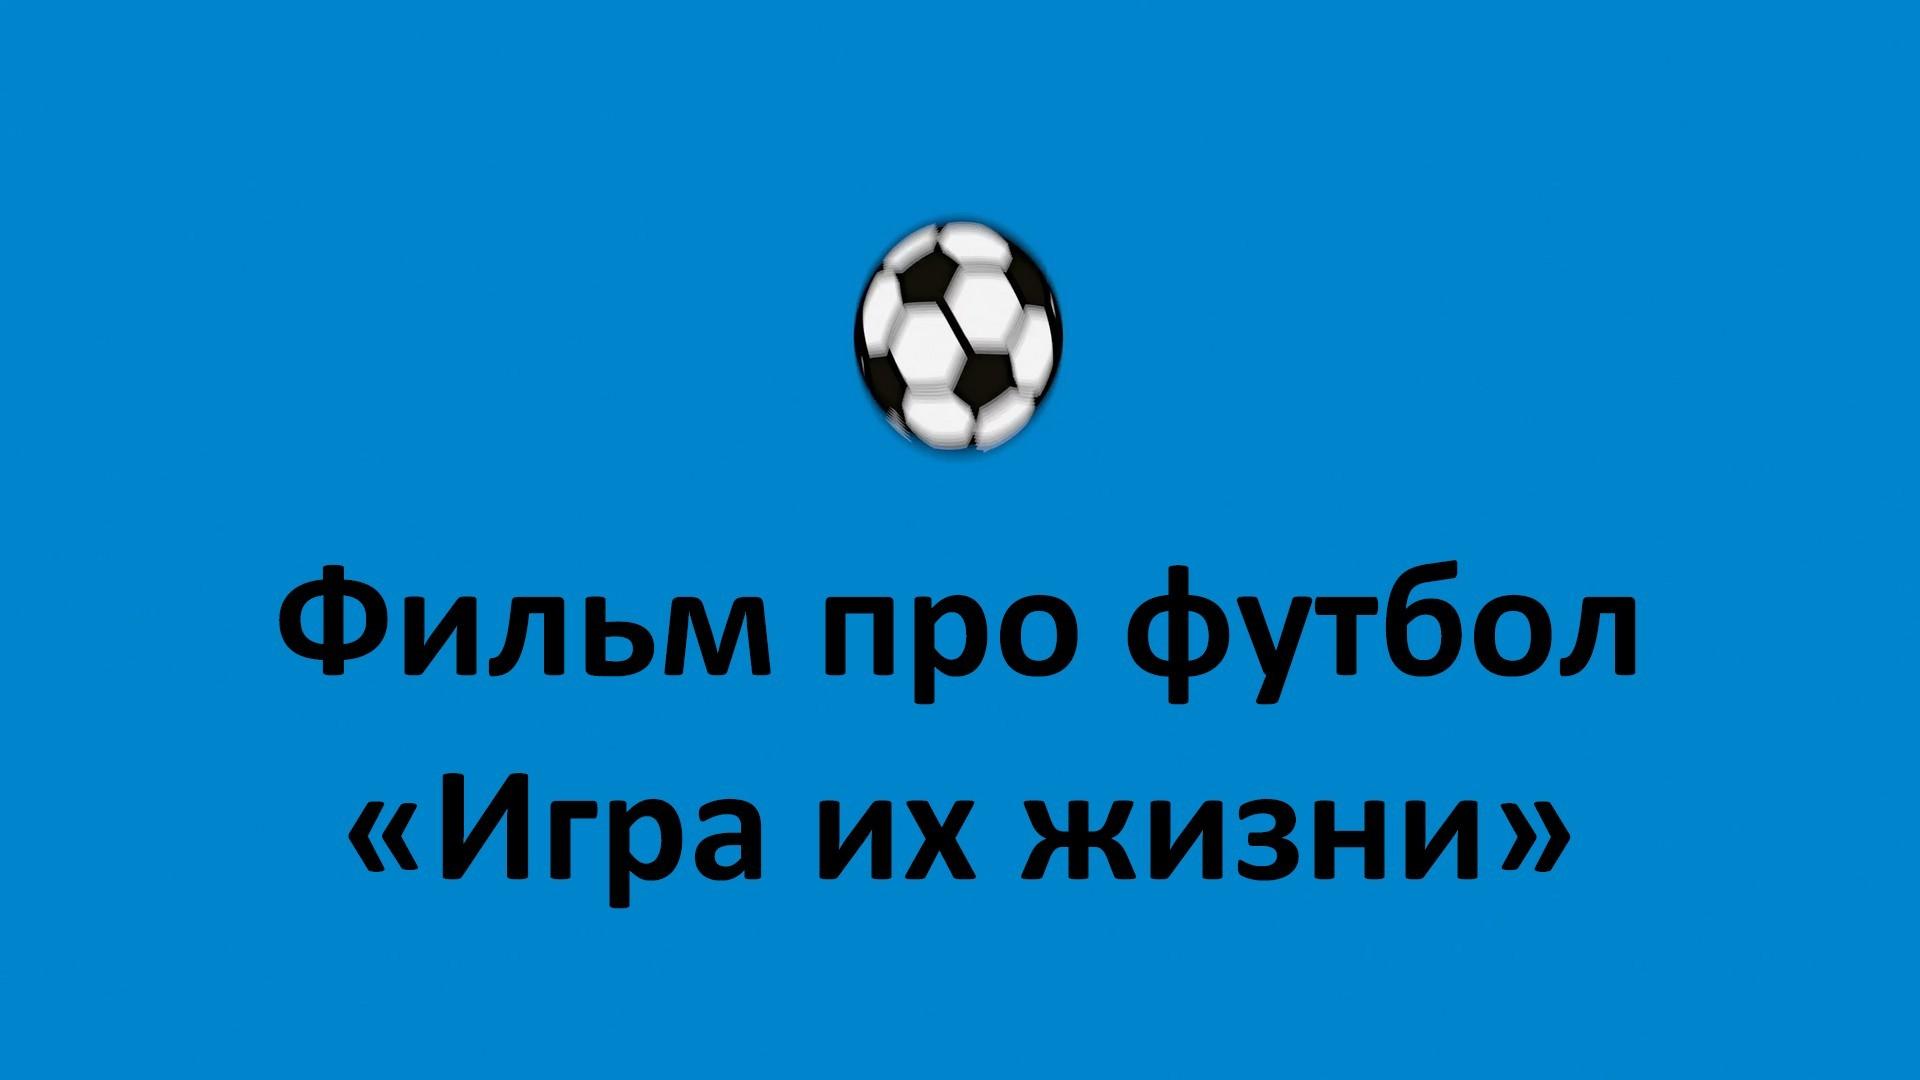 Фильм про футбол «Игра их жизни»